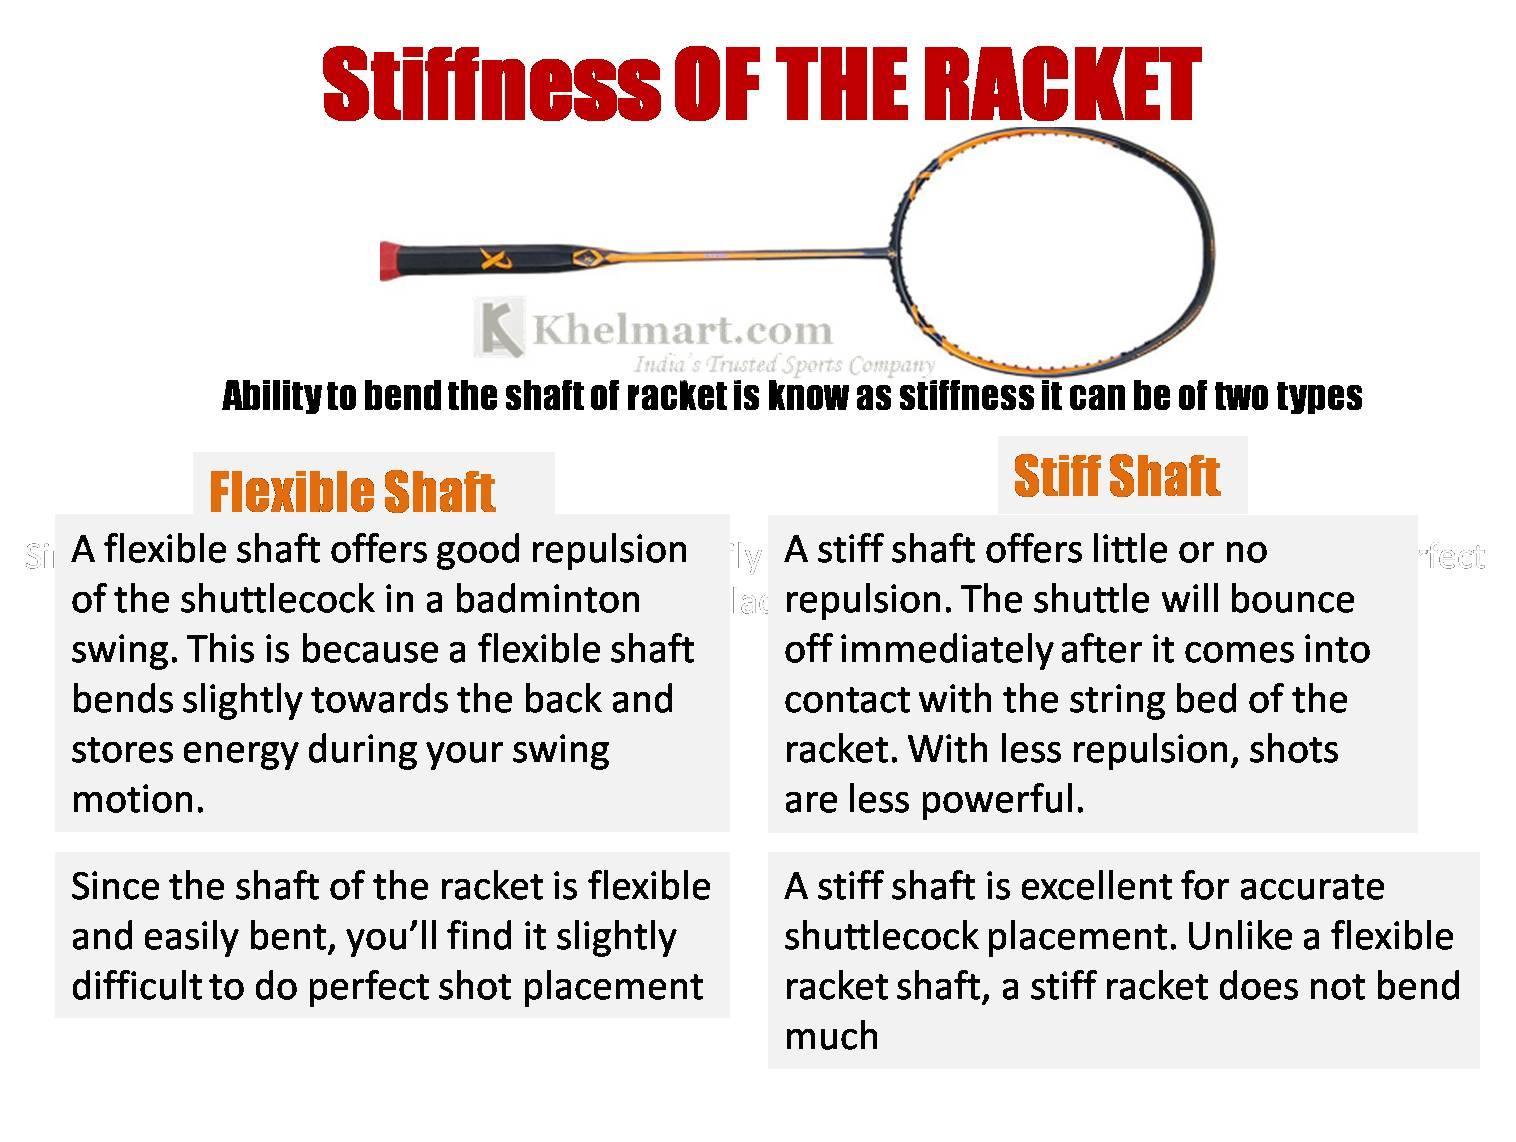 Stiffness_Badminton_racket_Khelmart